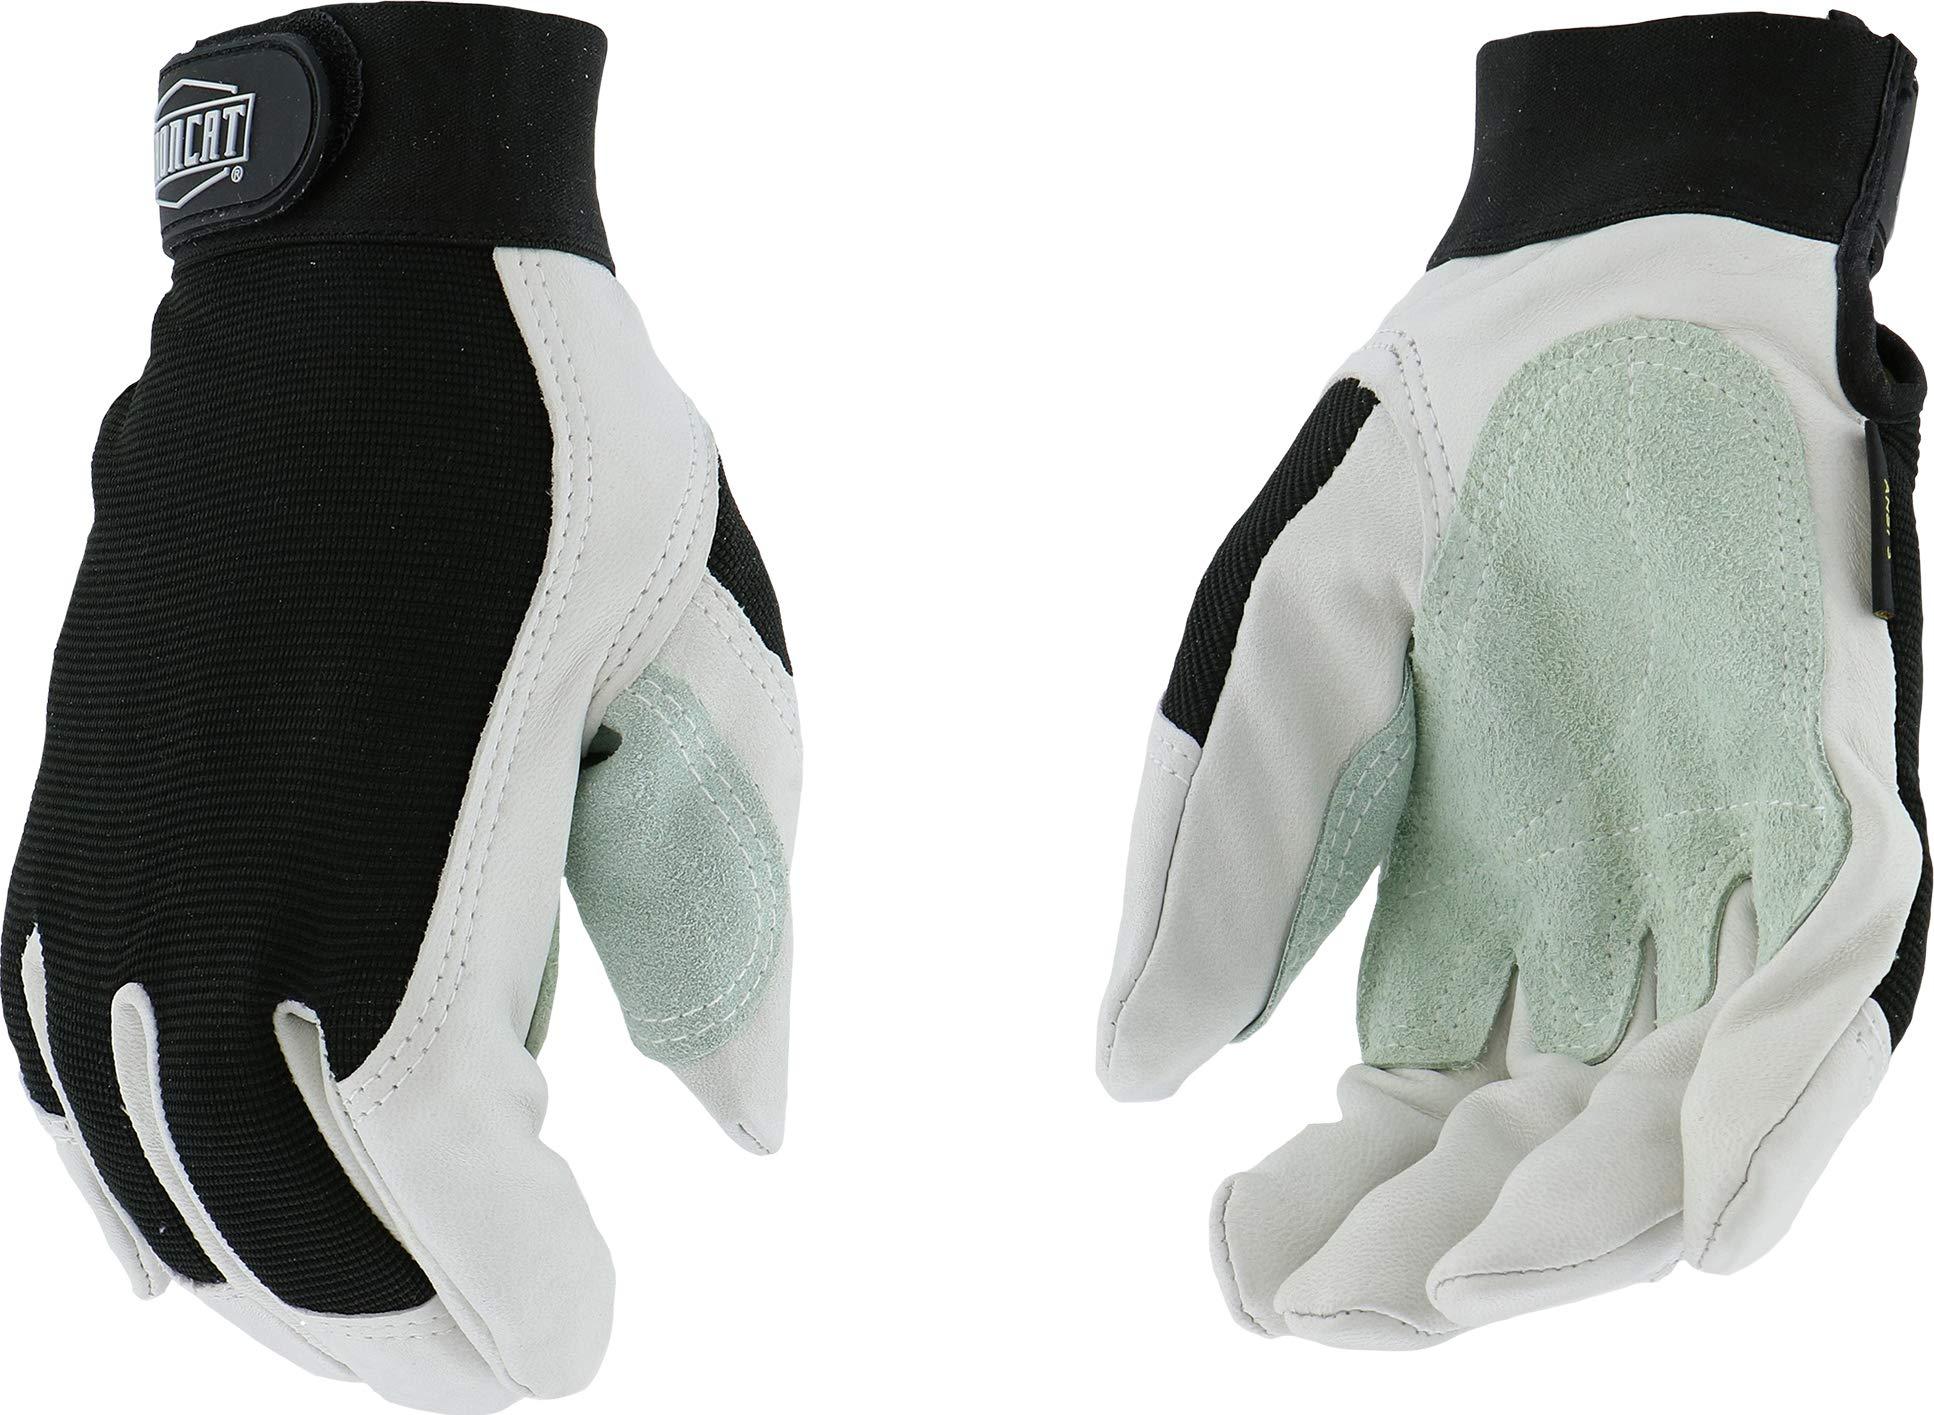 West Chester IRONCAT 86552 Premium Top Grain Goatskin Leather Cut Resistant Work Gloves: Medium, 1 Pair